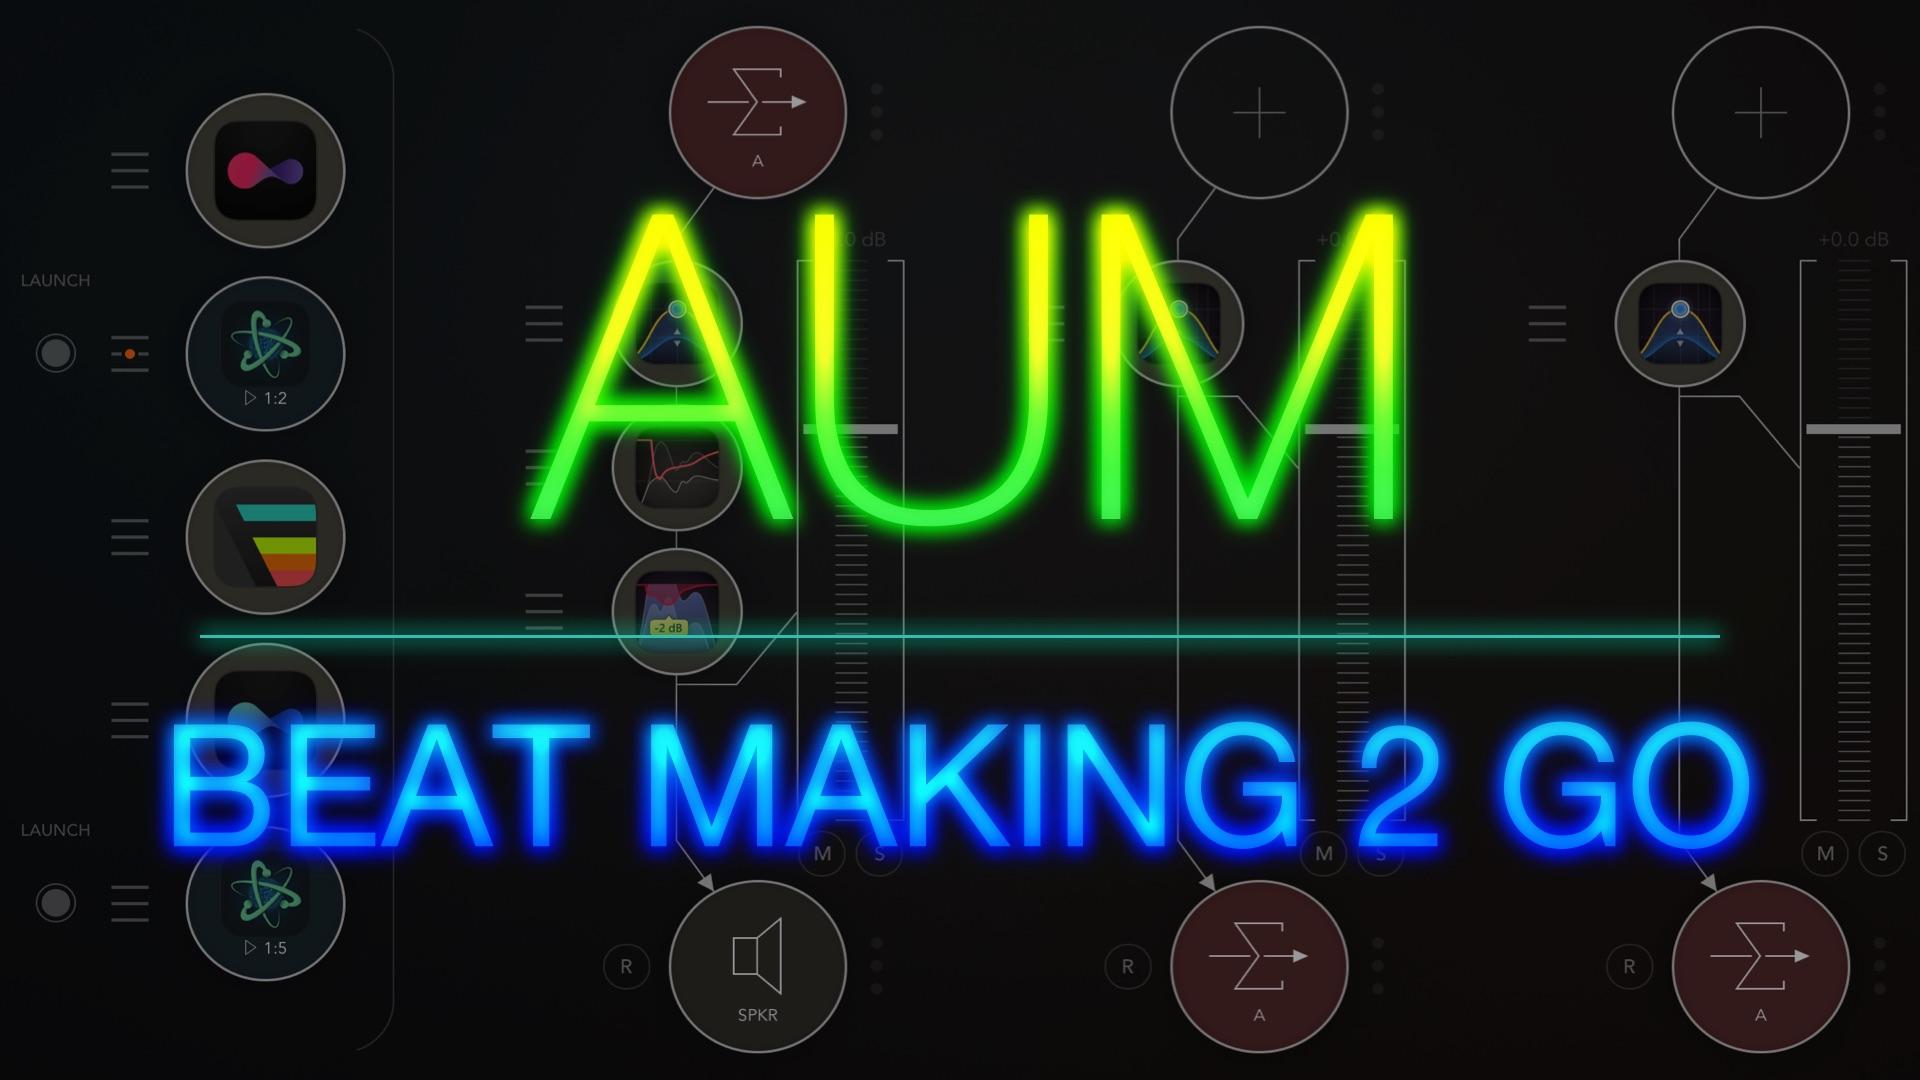 Beat Making 2 Go: AUM der digitale Mixer